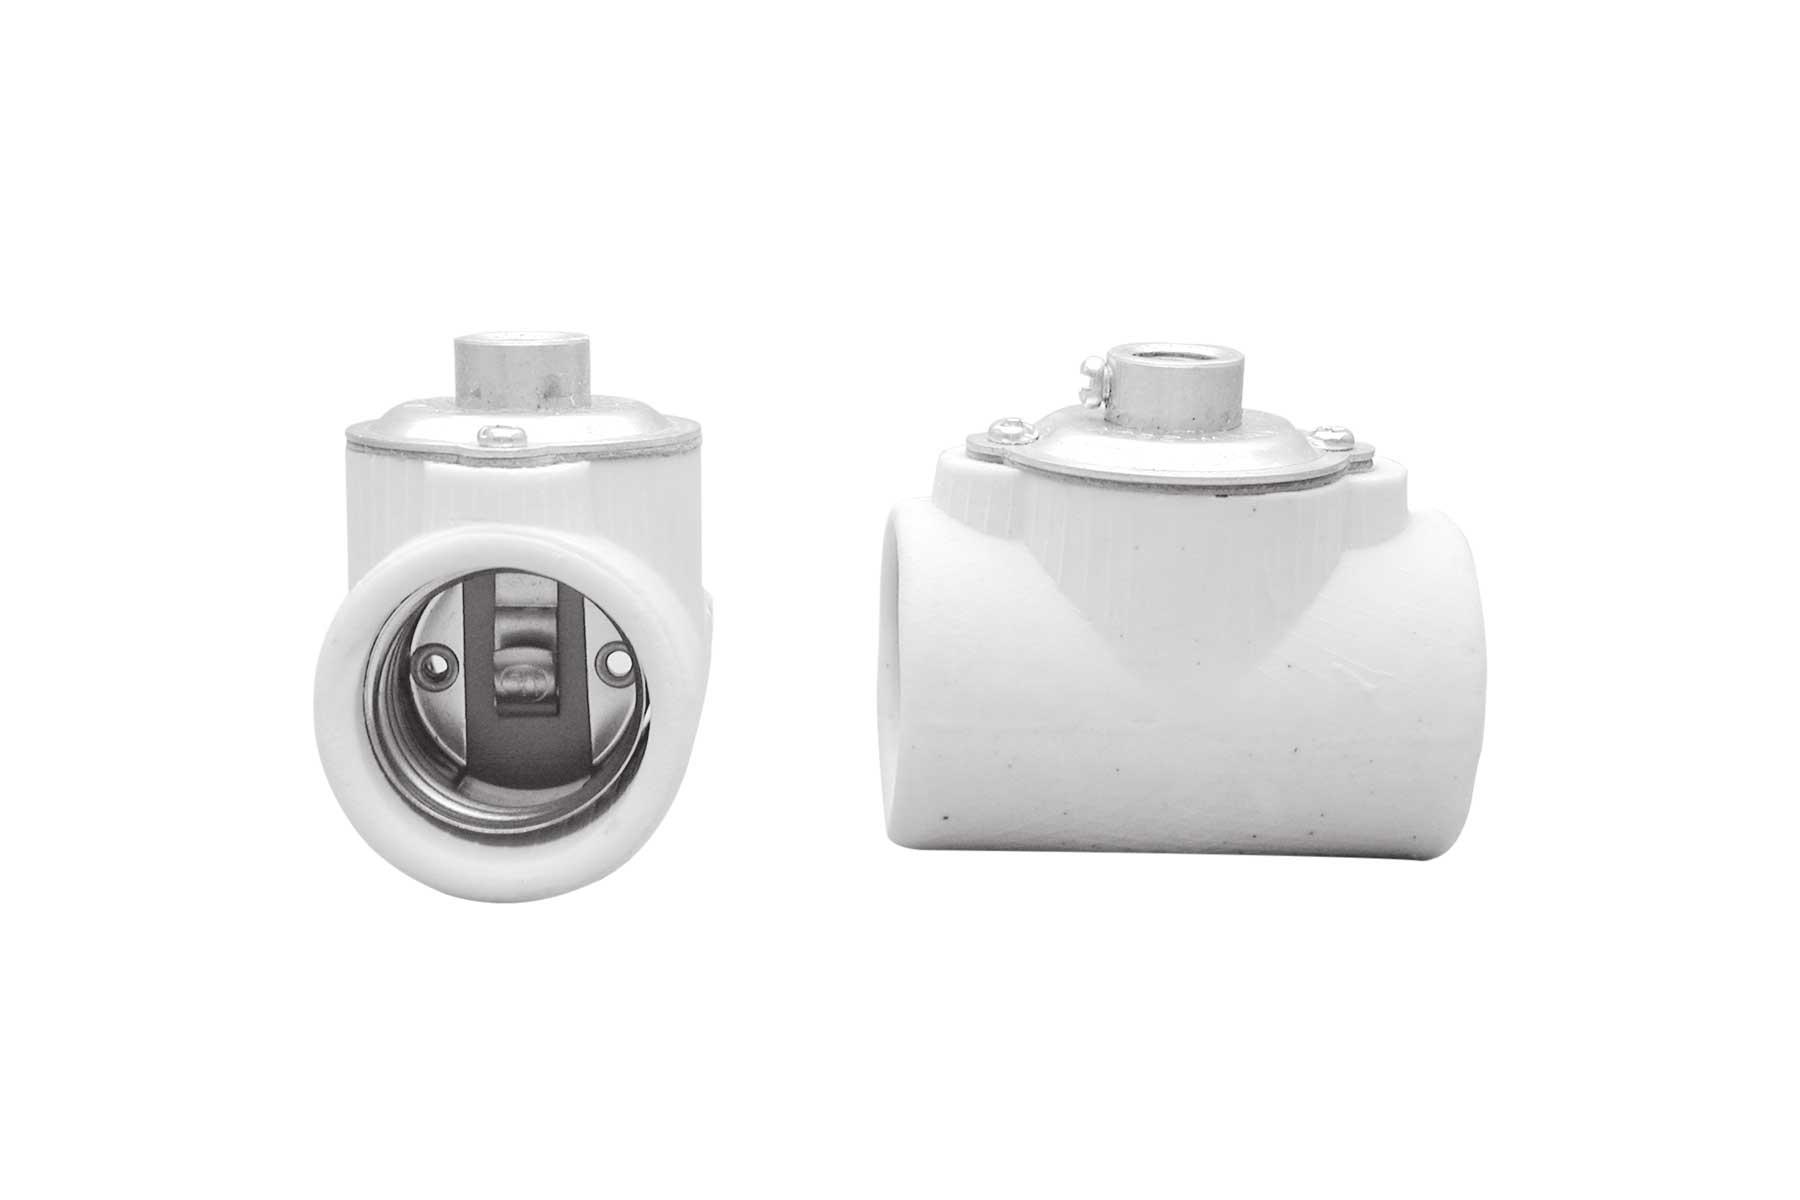 Medium Base Short Body Twin Porcelain Keyless Incandescent Light Socket